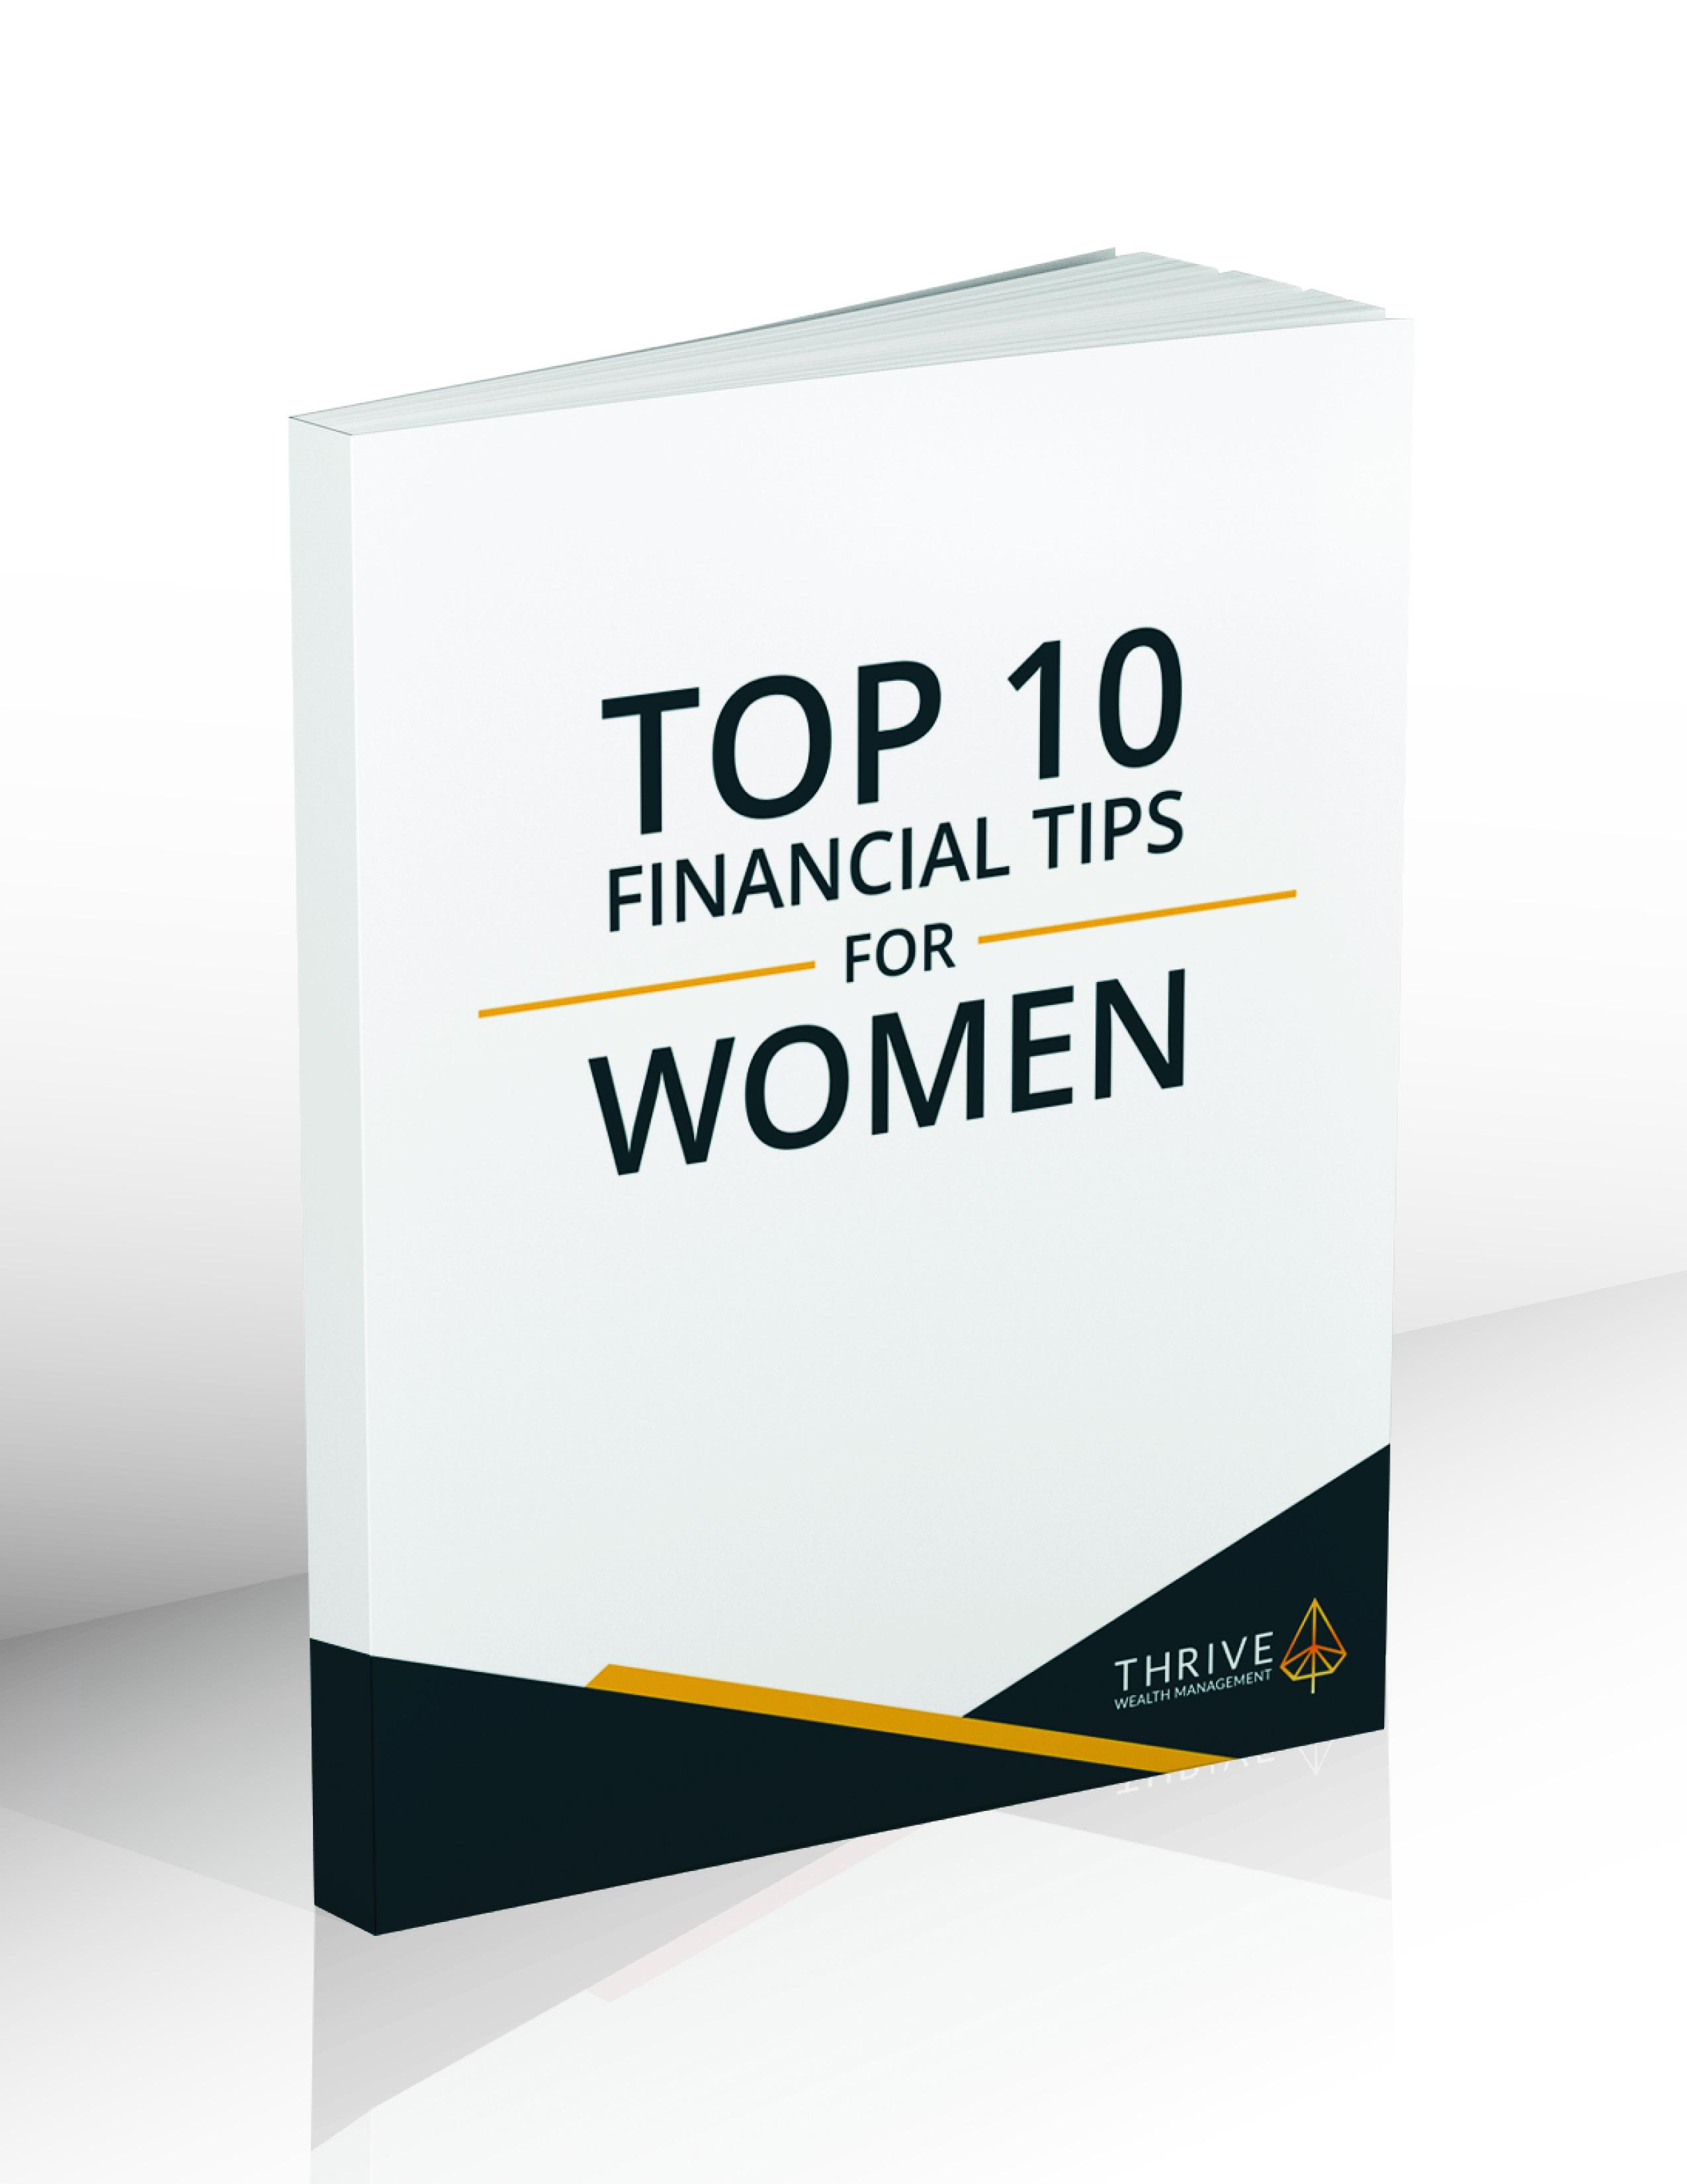 269502_Top 10 Financial Tips for Women_MockUp2_080818